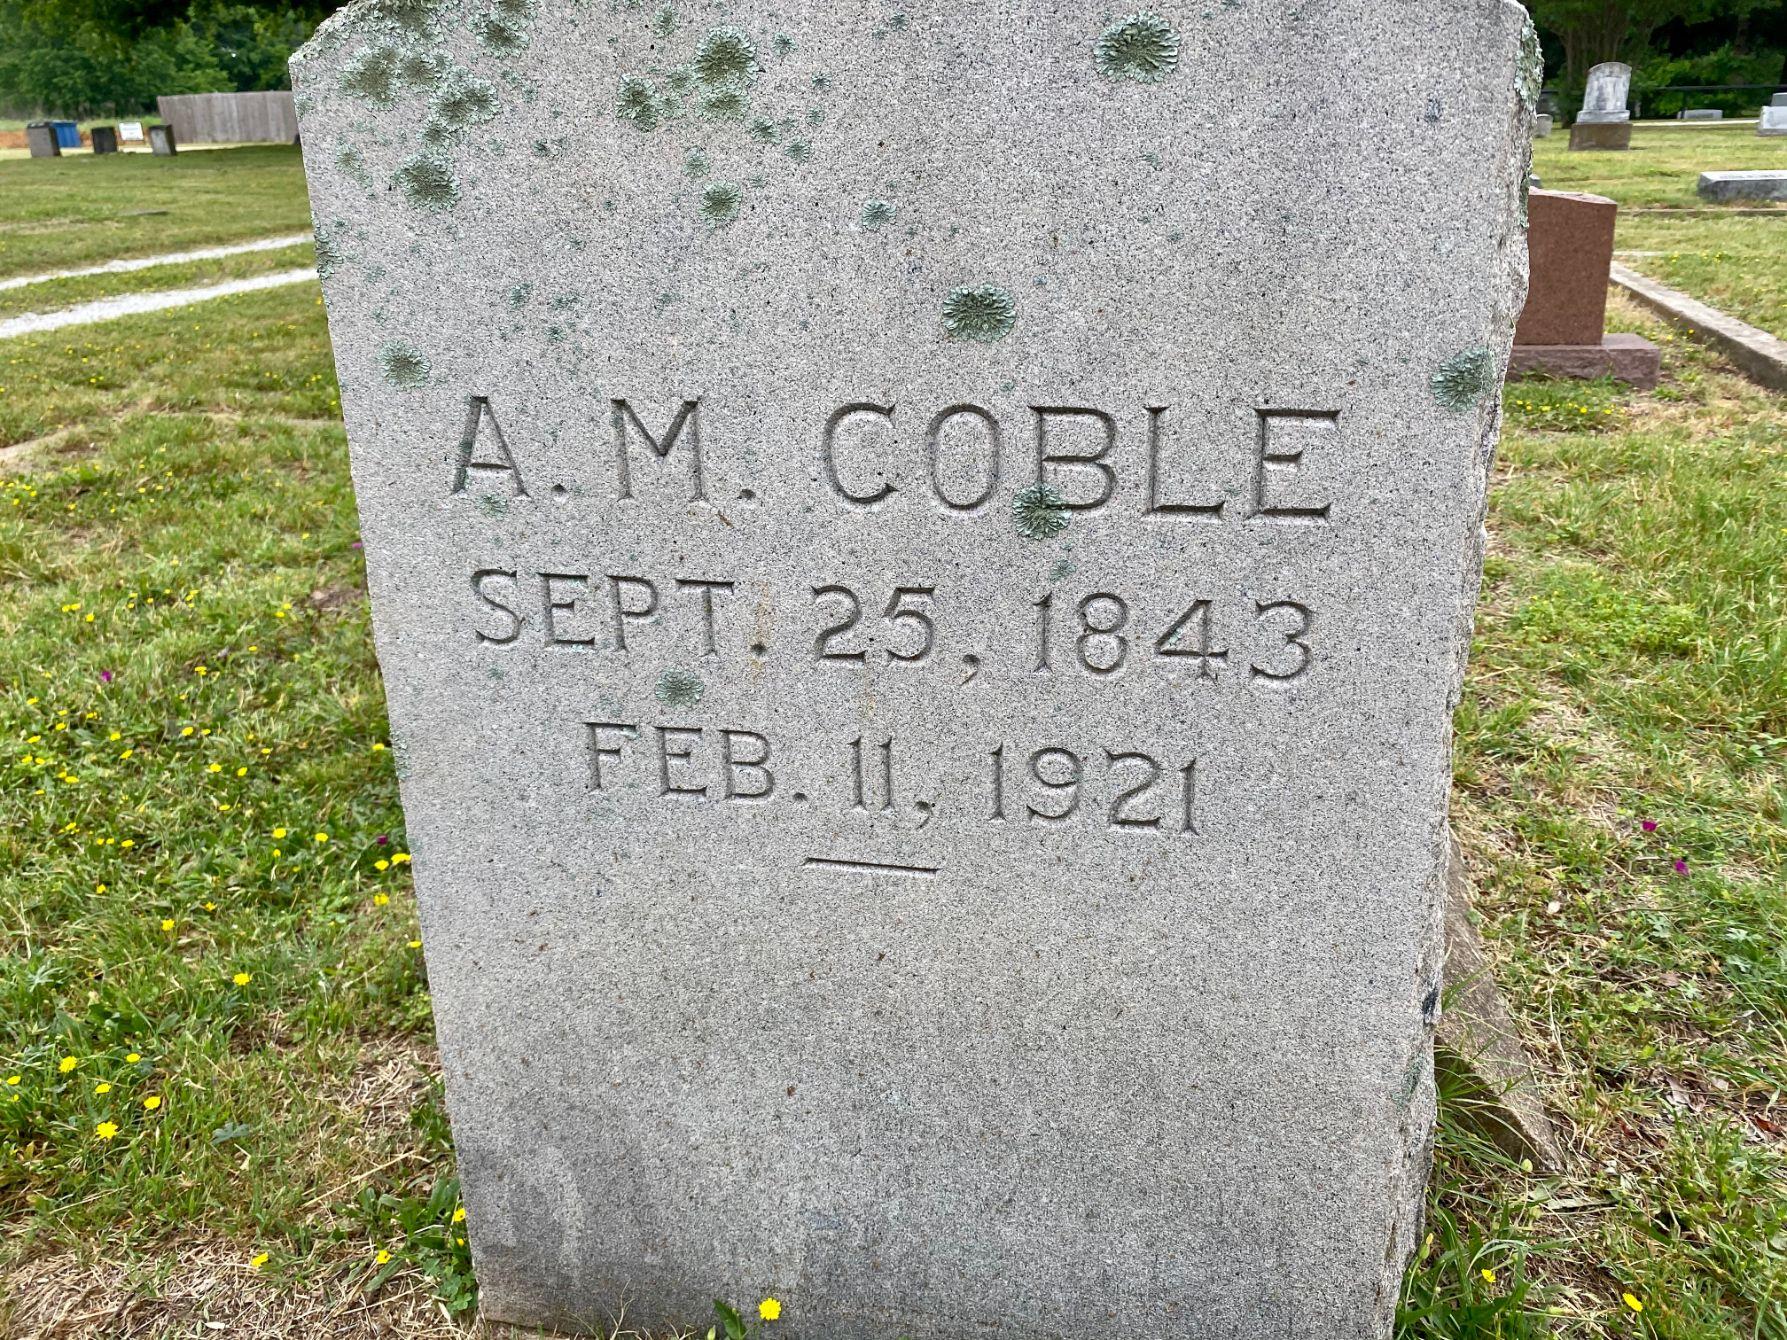 Coble